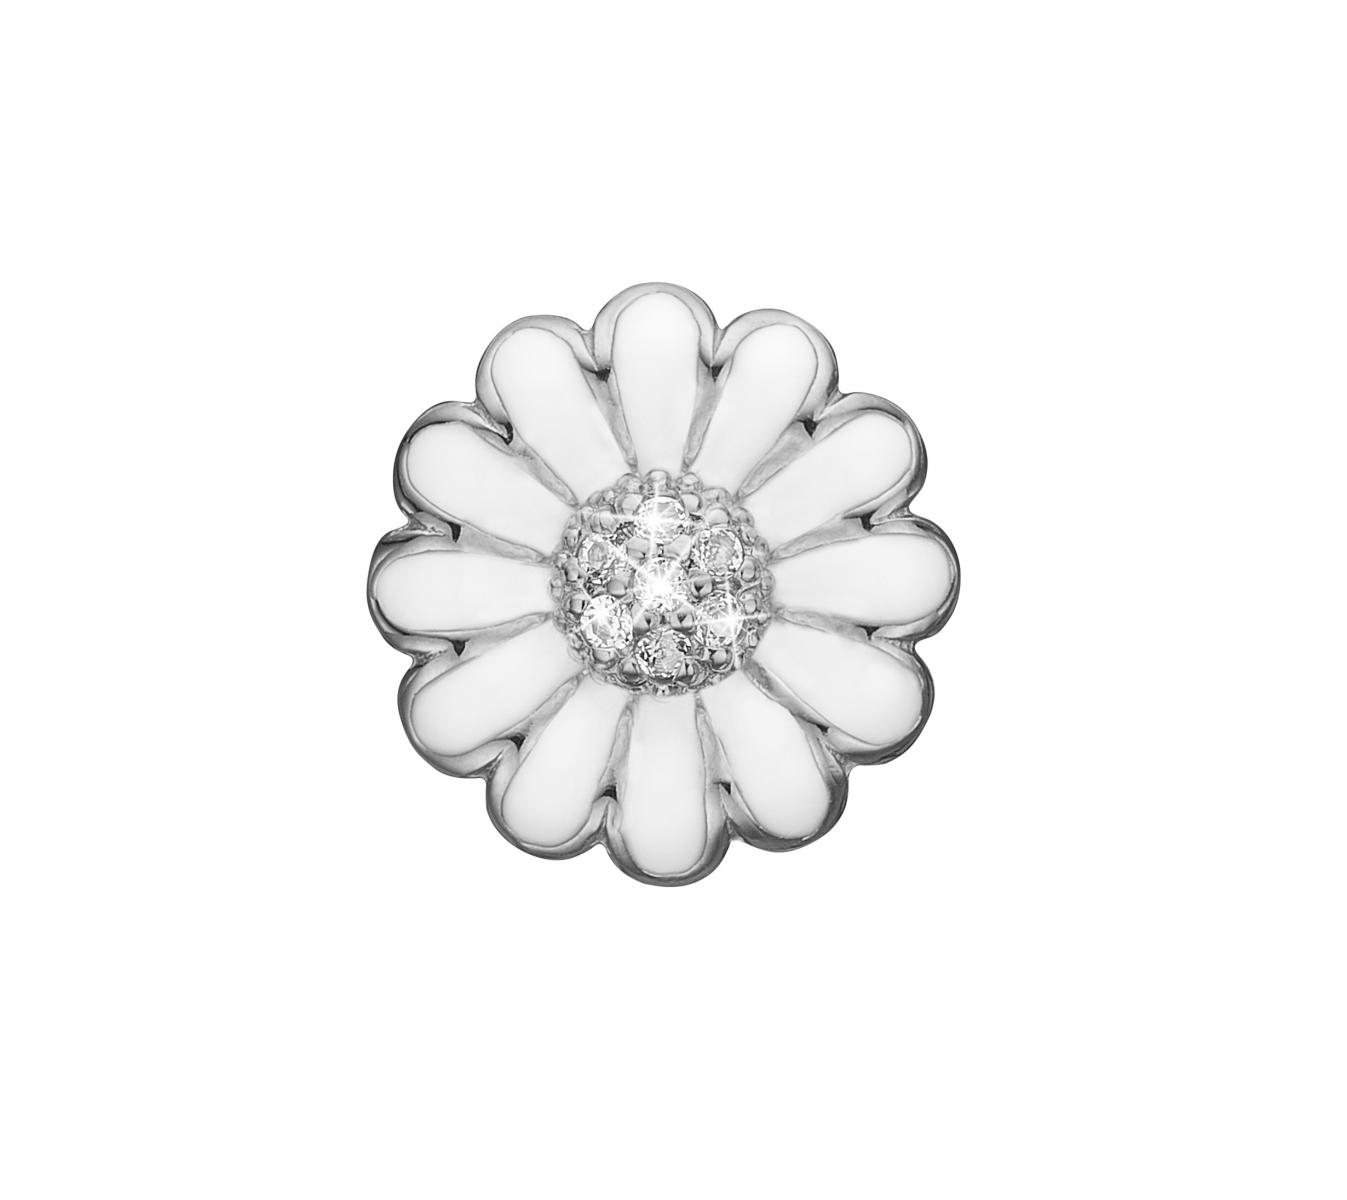 Christina topaz marguerite sølv charm - 650-S38